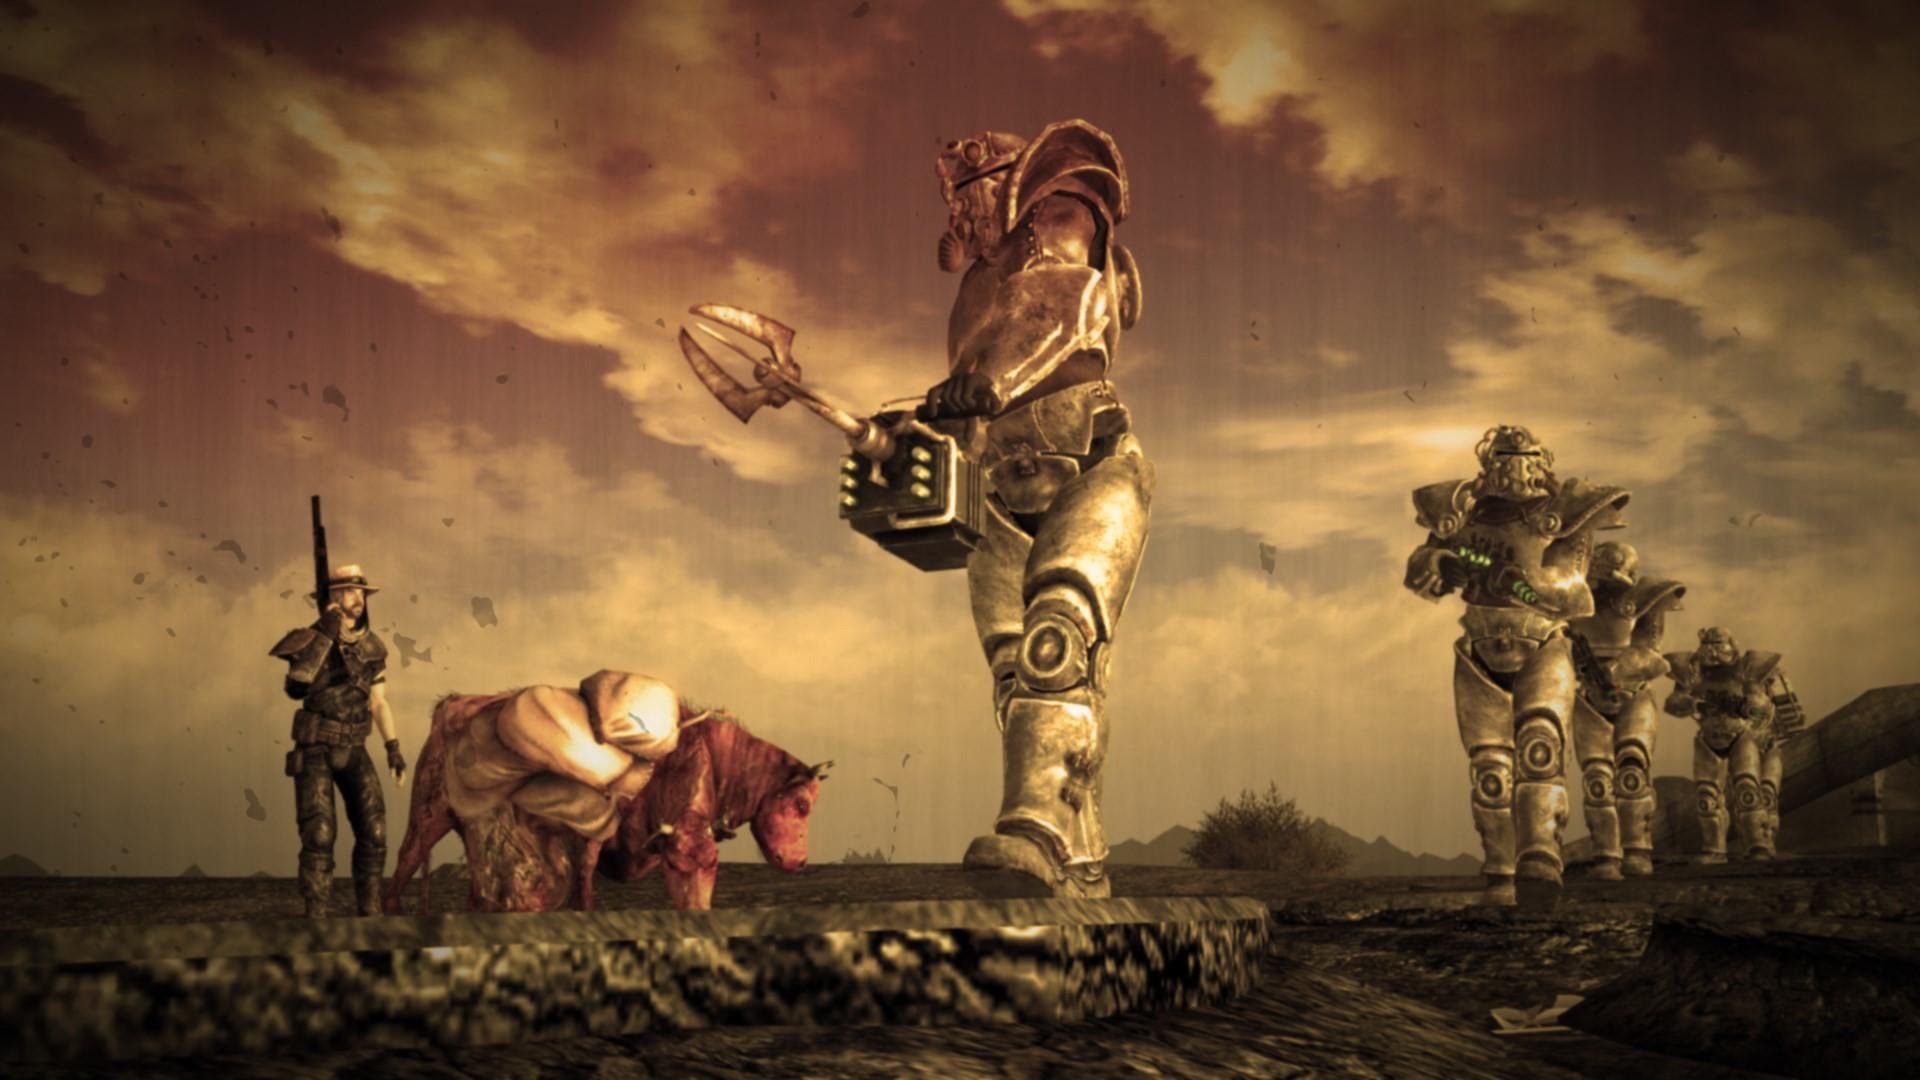 Fallout 2 Wallpaper 1920x1080 Download